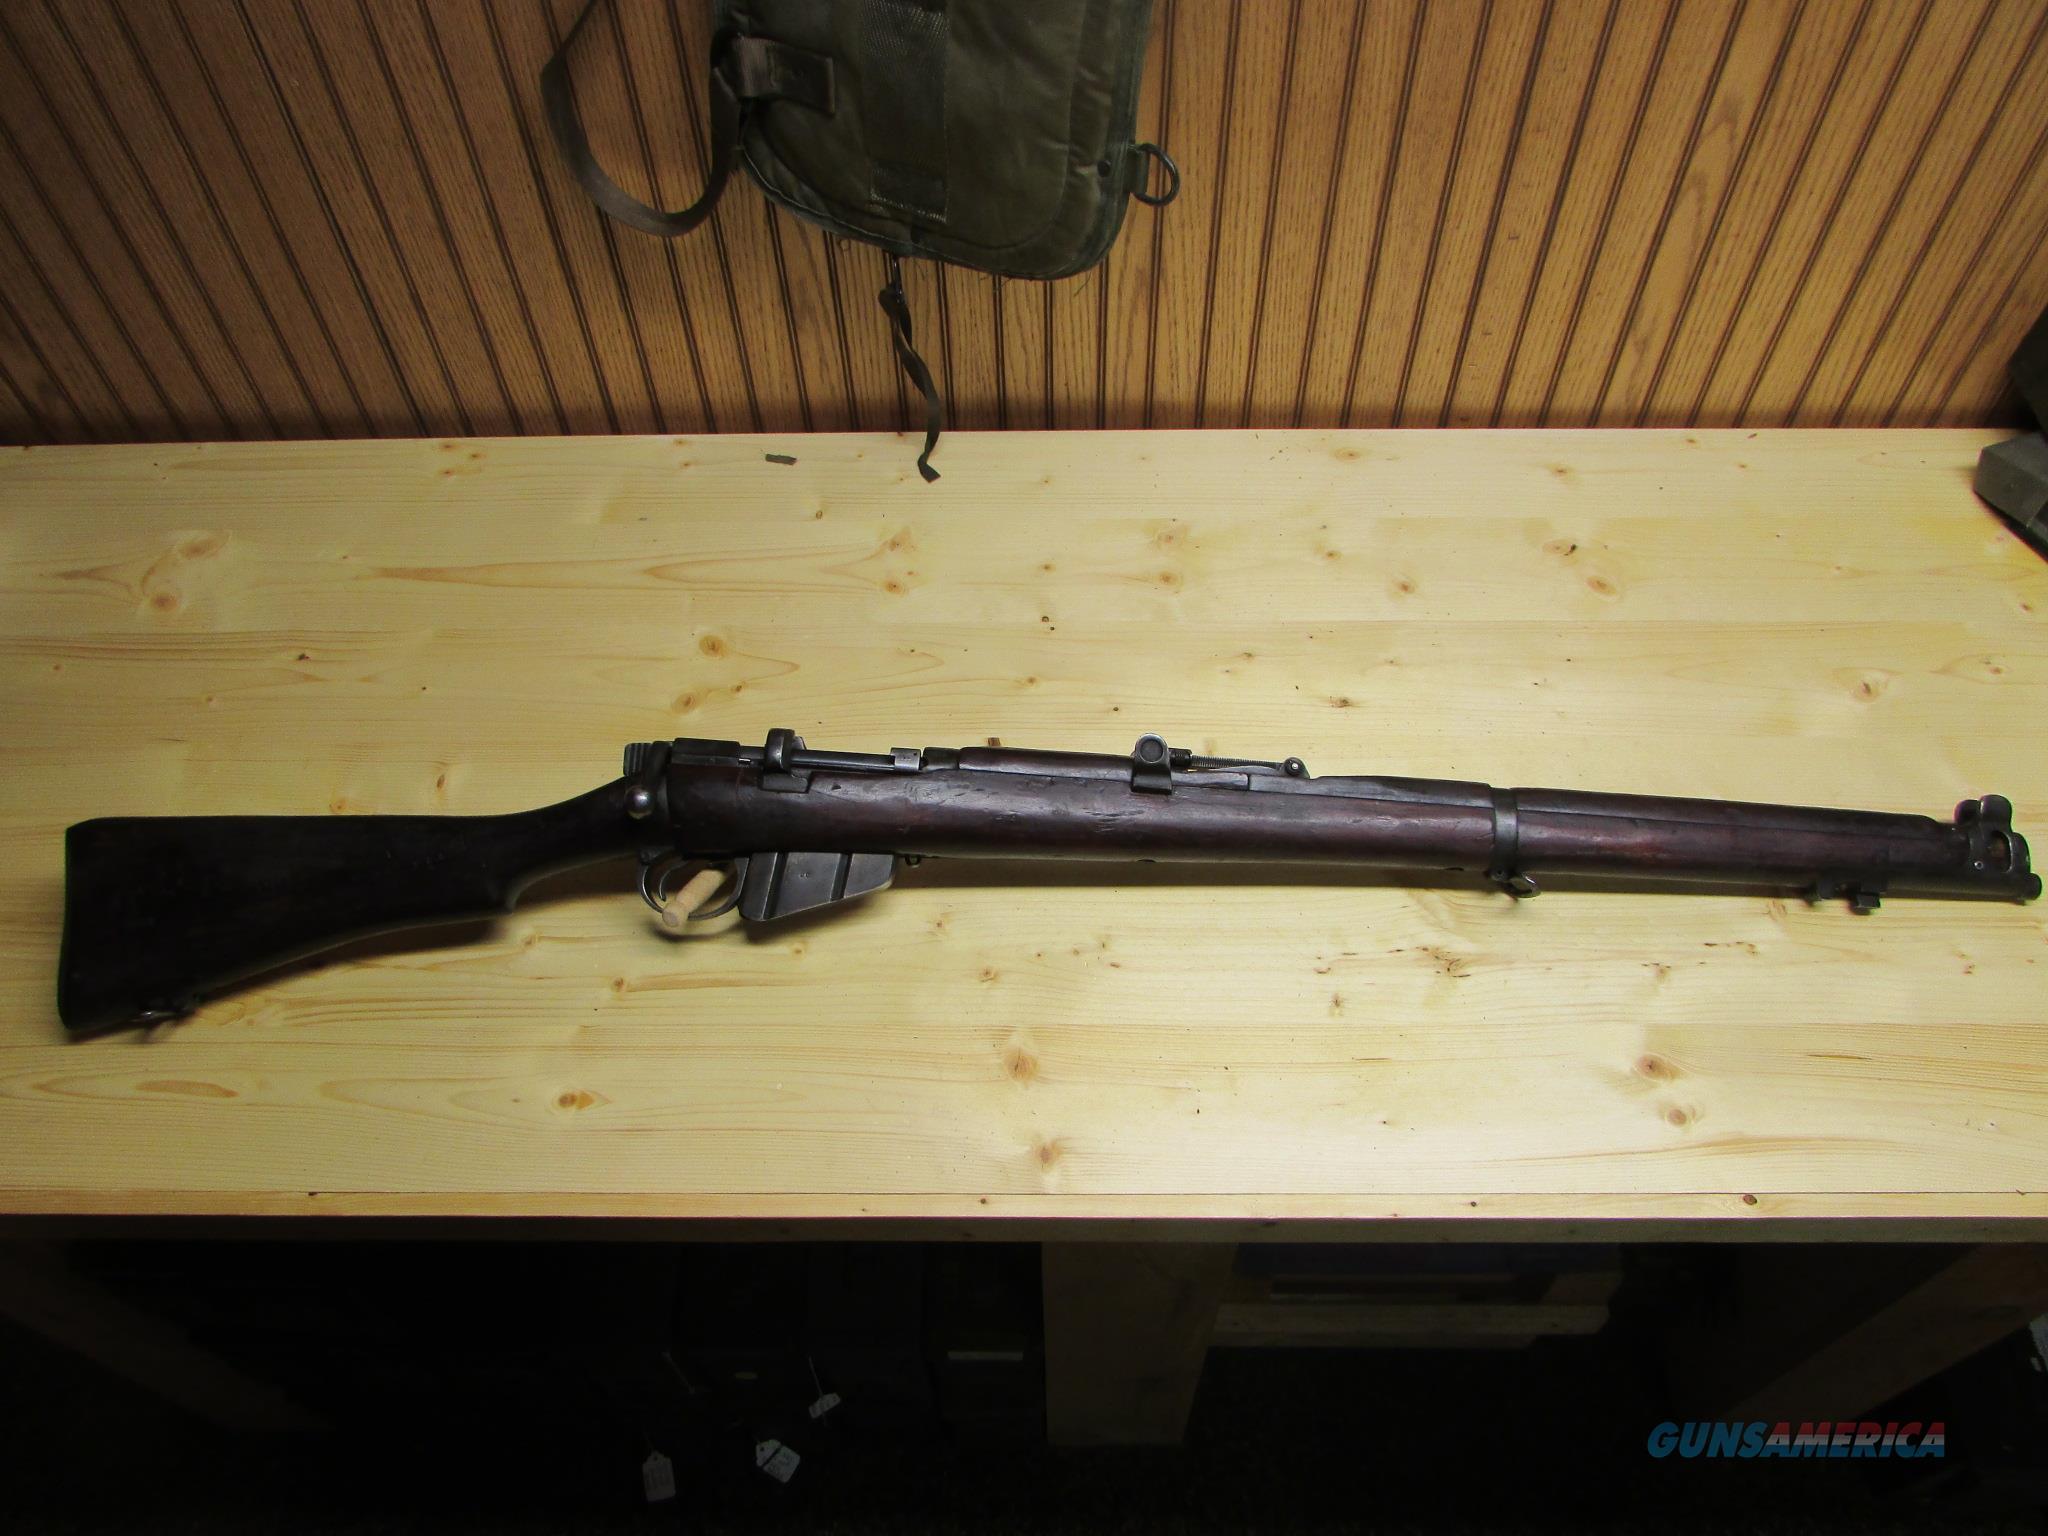 BRITISH ENFIELD NO. 2 MK IV .22 CAL MILITARY TRAINING RIFLE  Guns > Rifles > Military Misc. Rifles Non-US > Other